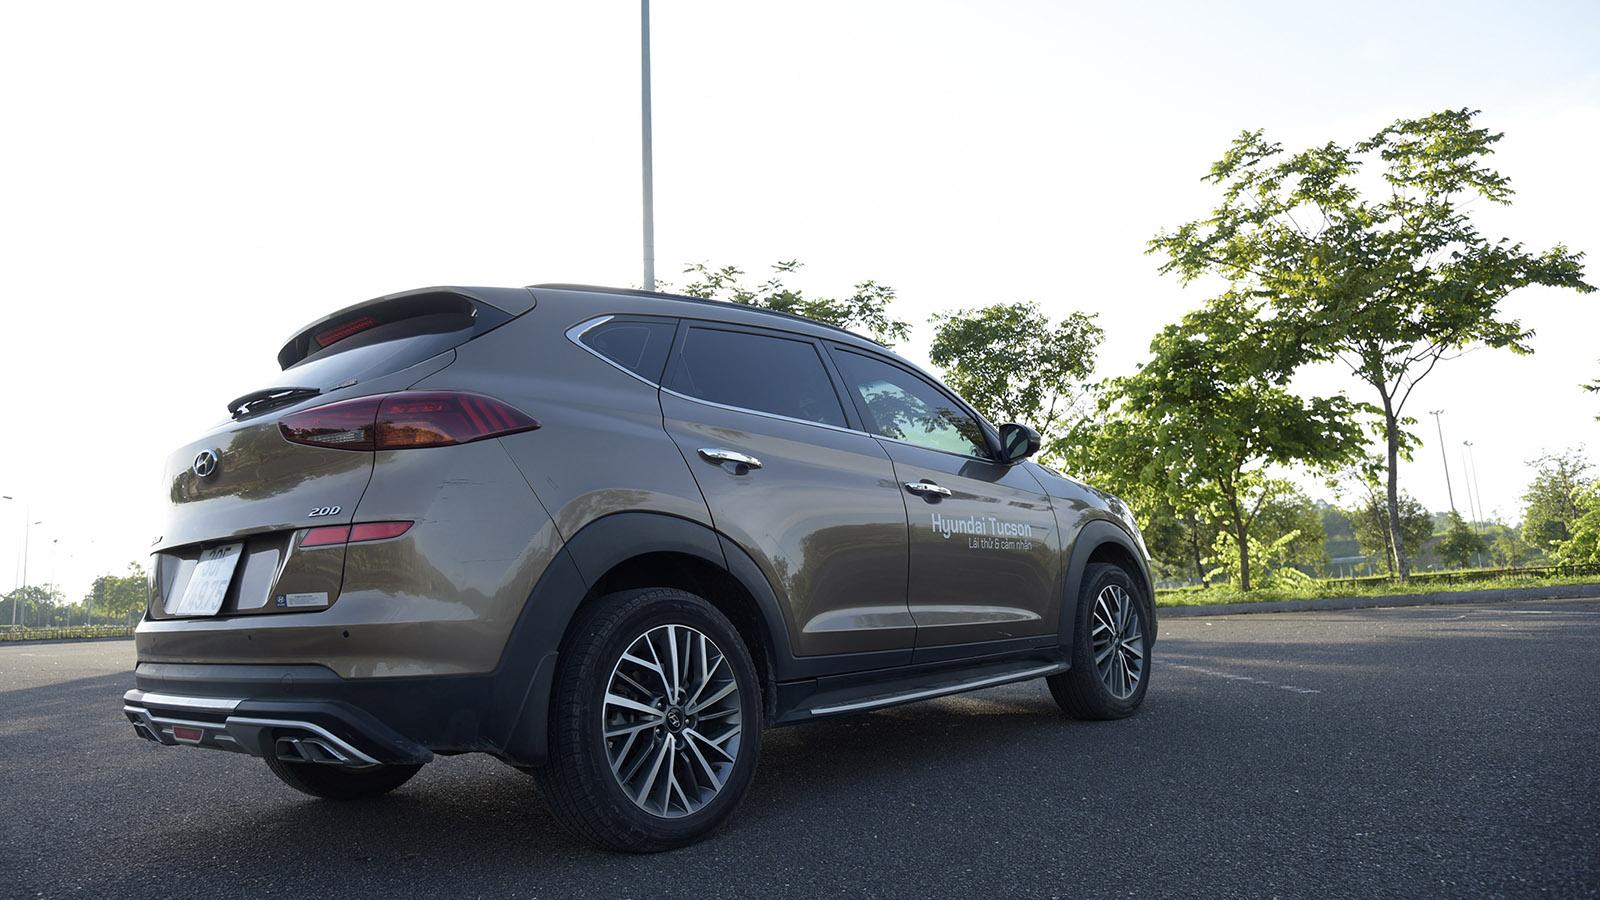 Thiết kế sau xe Hyundai Tucson 2020